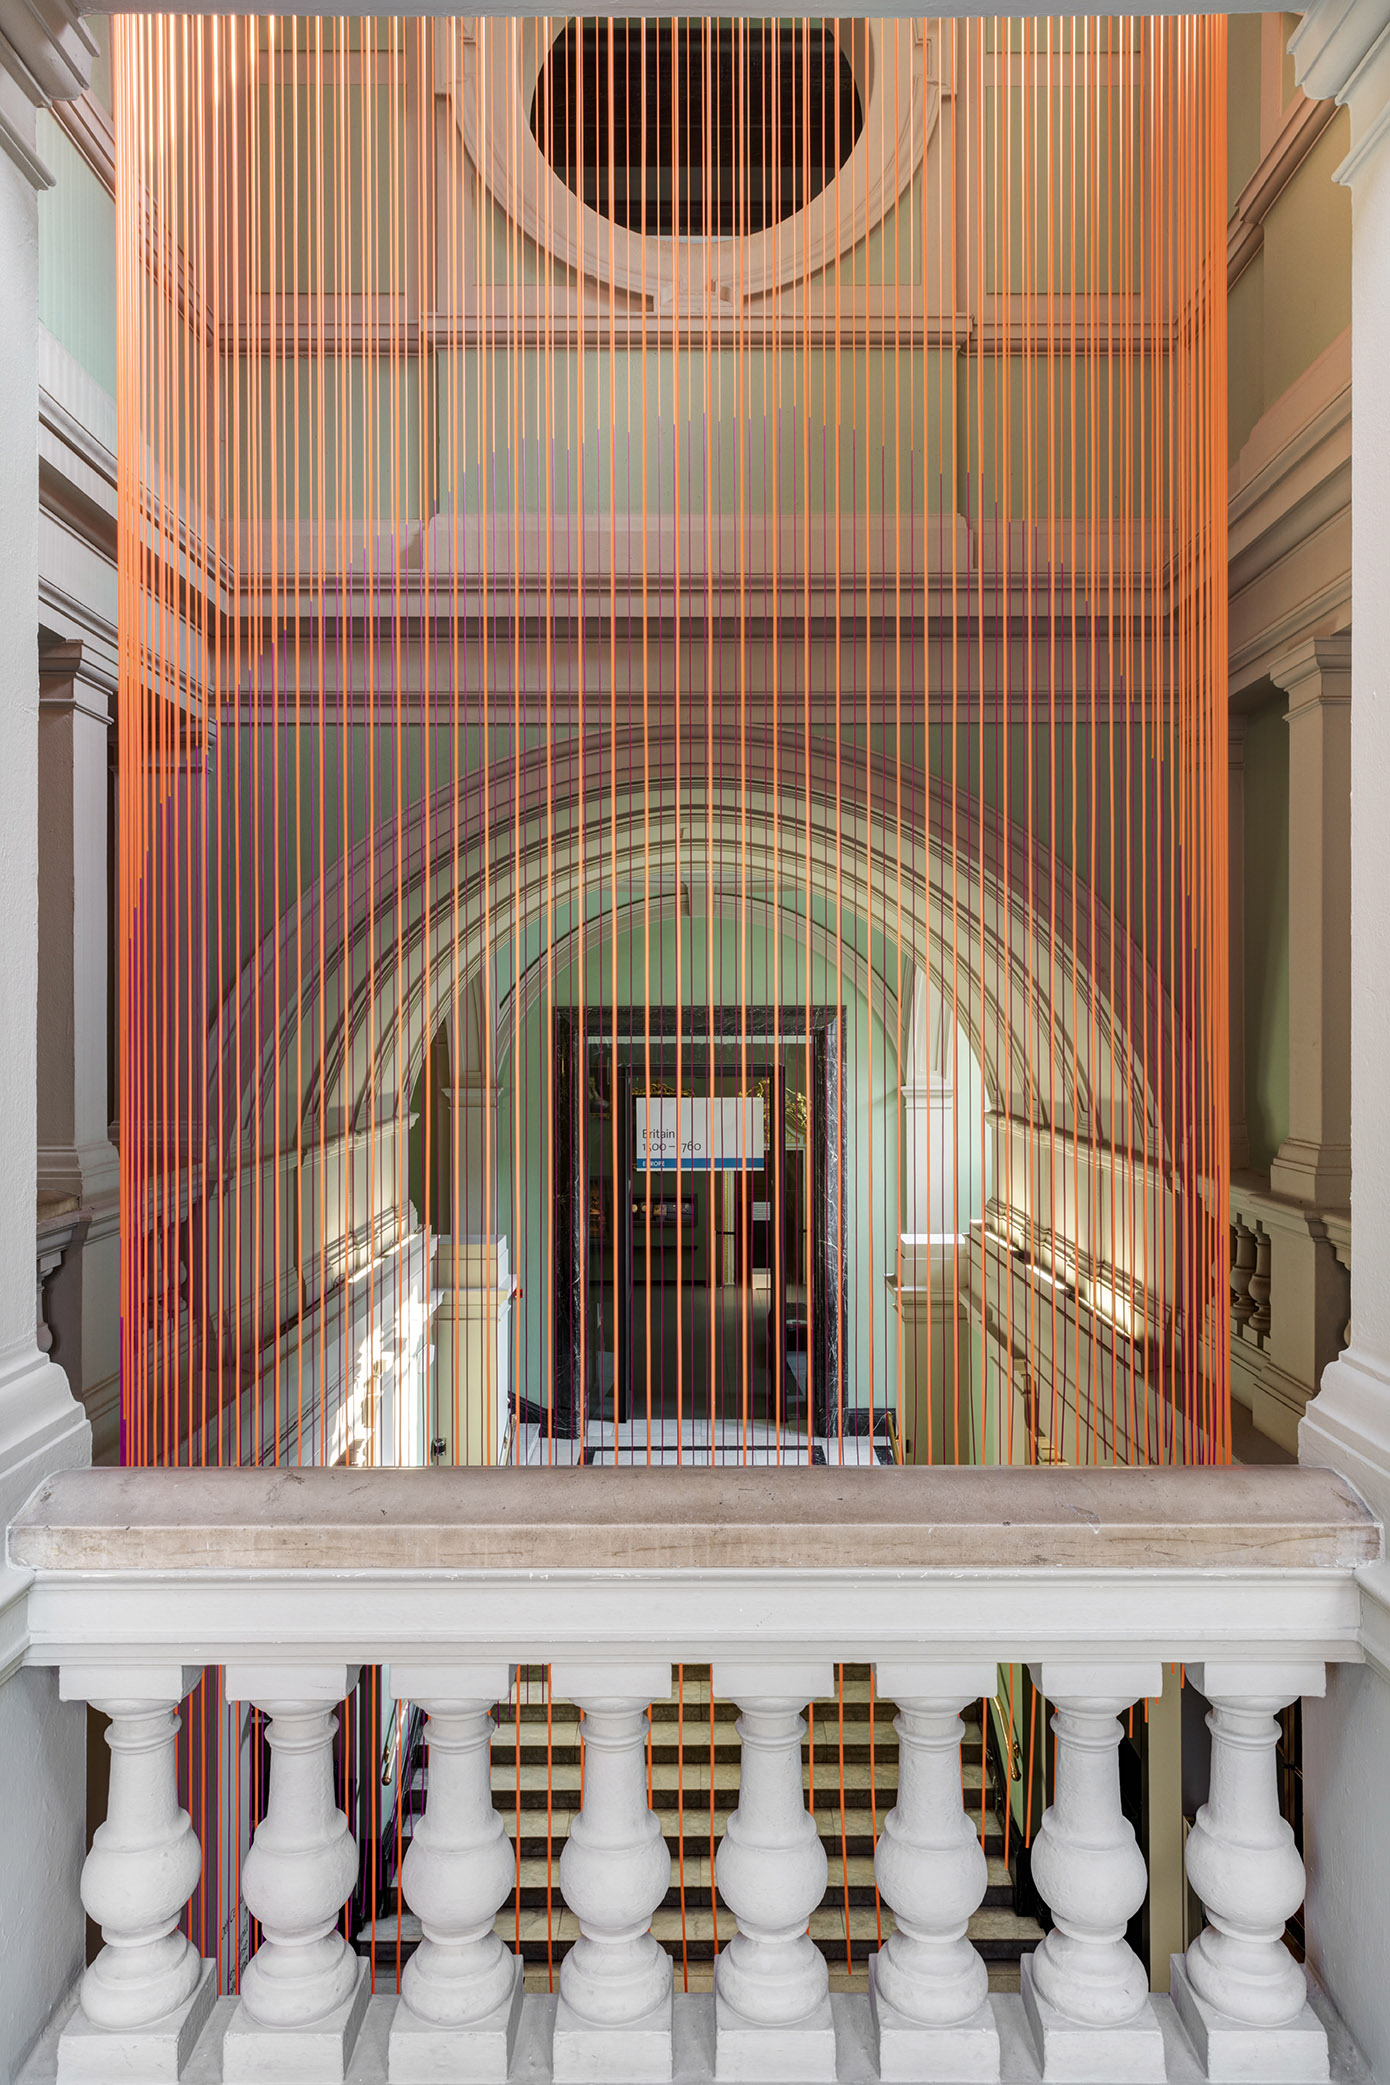 Orange silicon cords dangle in Victoria and Albert Museum entrance above visitors heads